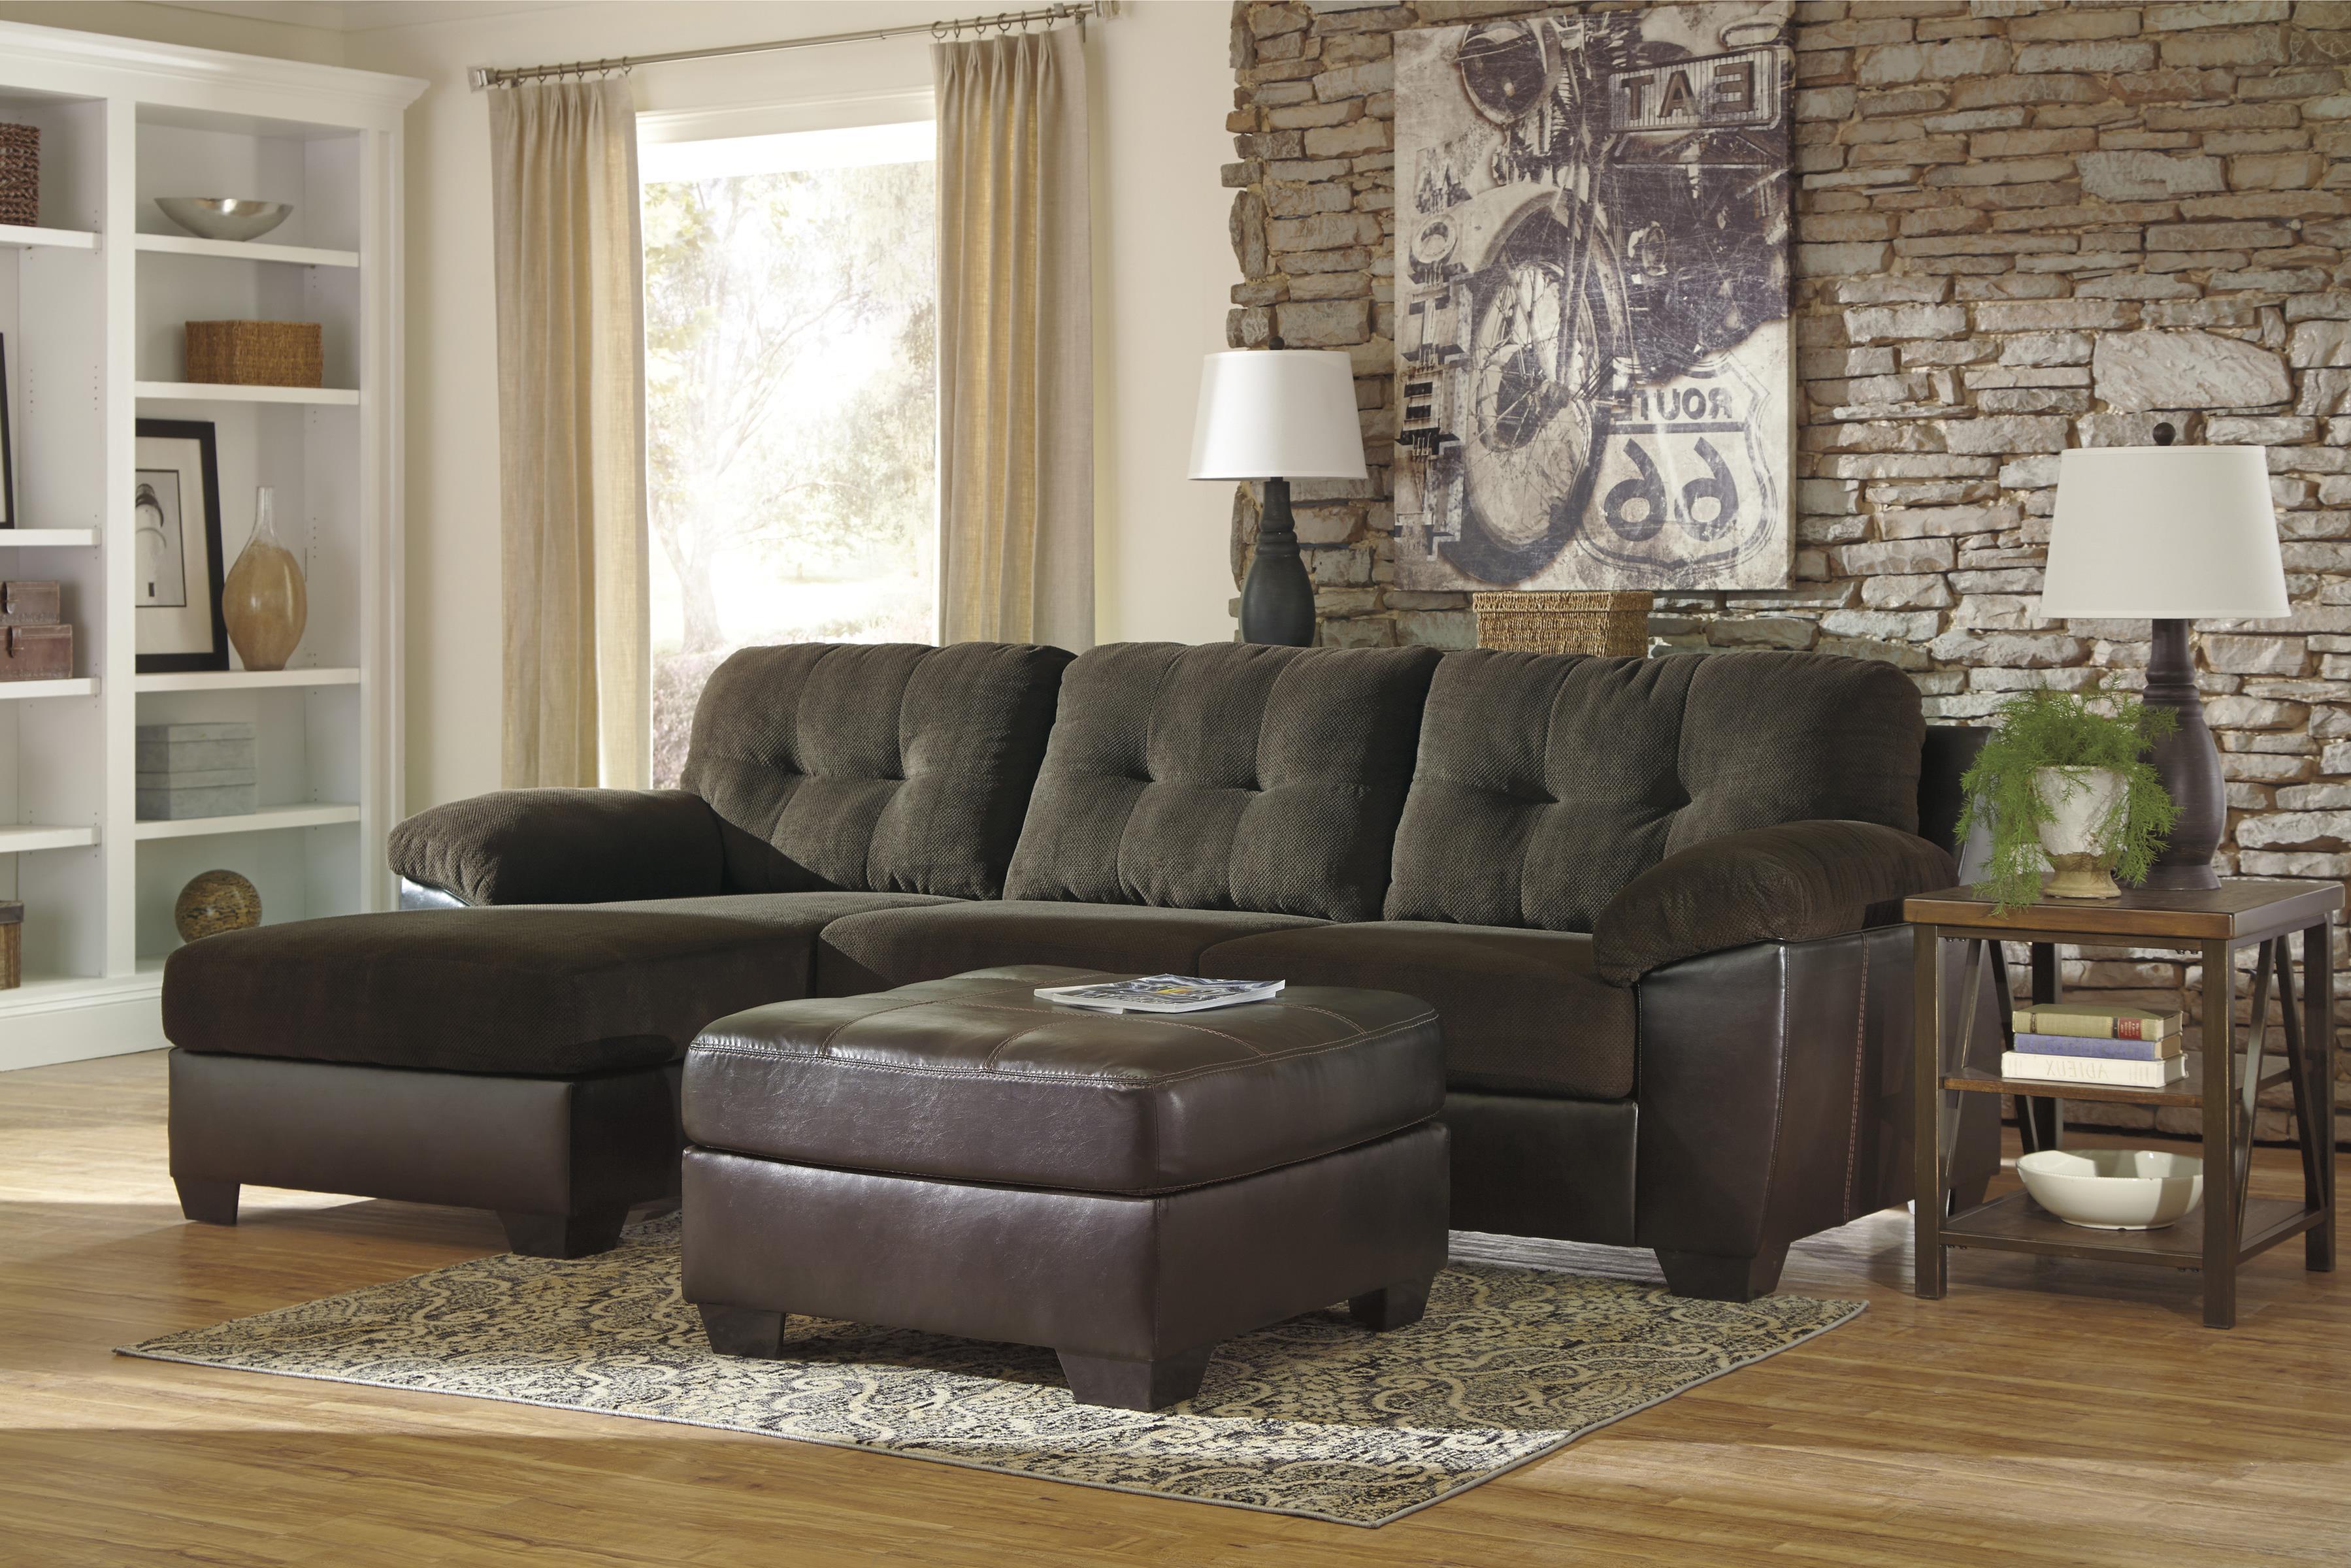 Benchcraft Vanleer Stationary Living Room Group - Item Number: 15900 Living Room Group 2